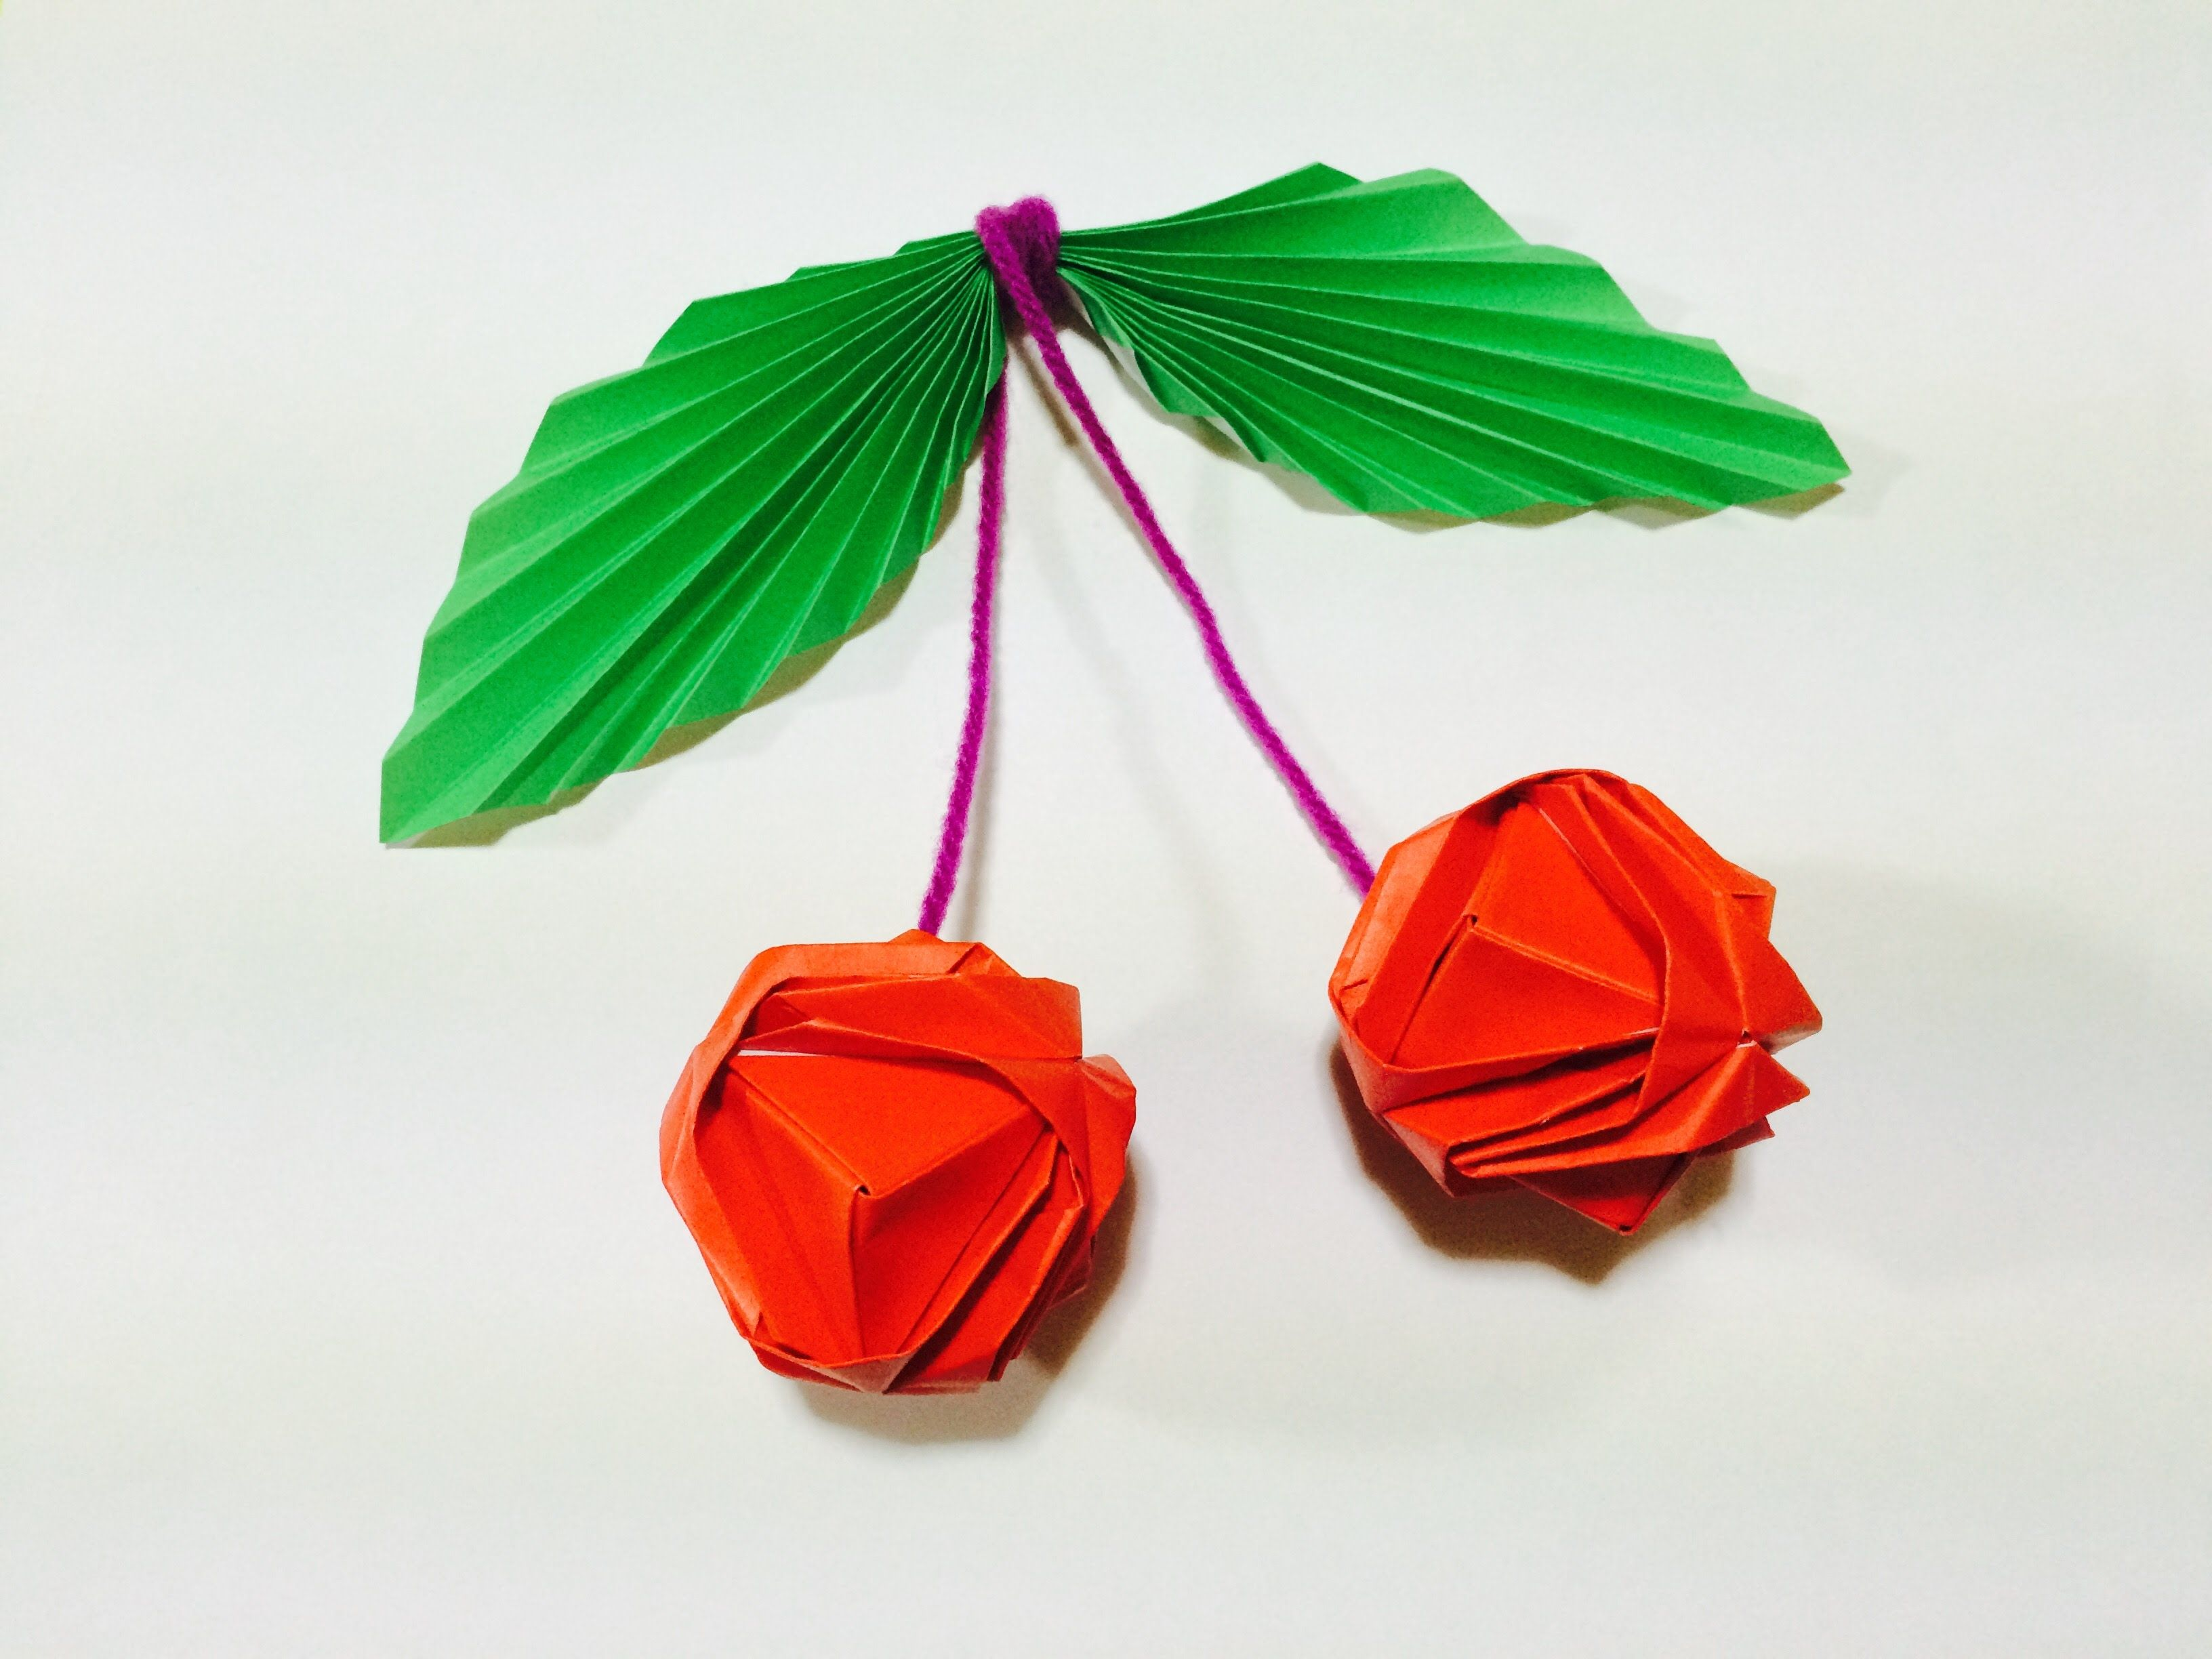 Pin By Graciela Morales Wayar On Origami Graciela Pinterest